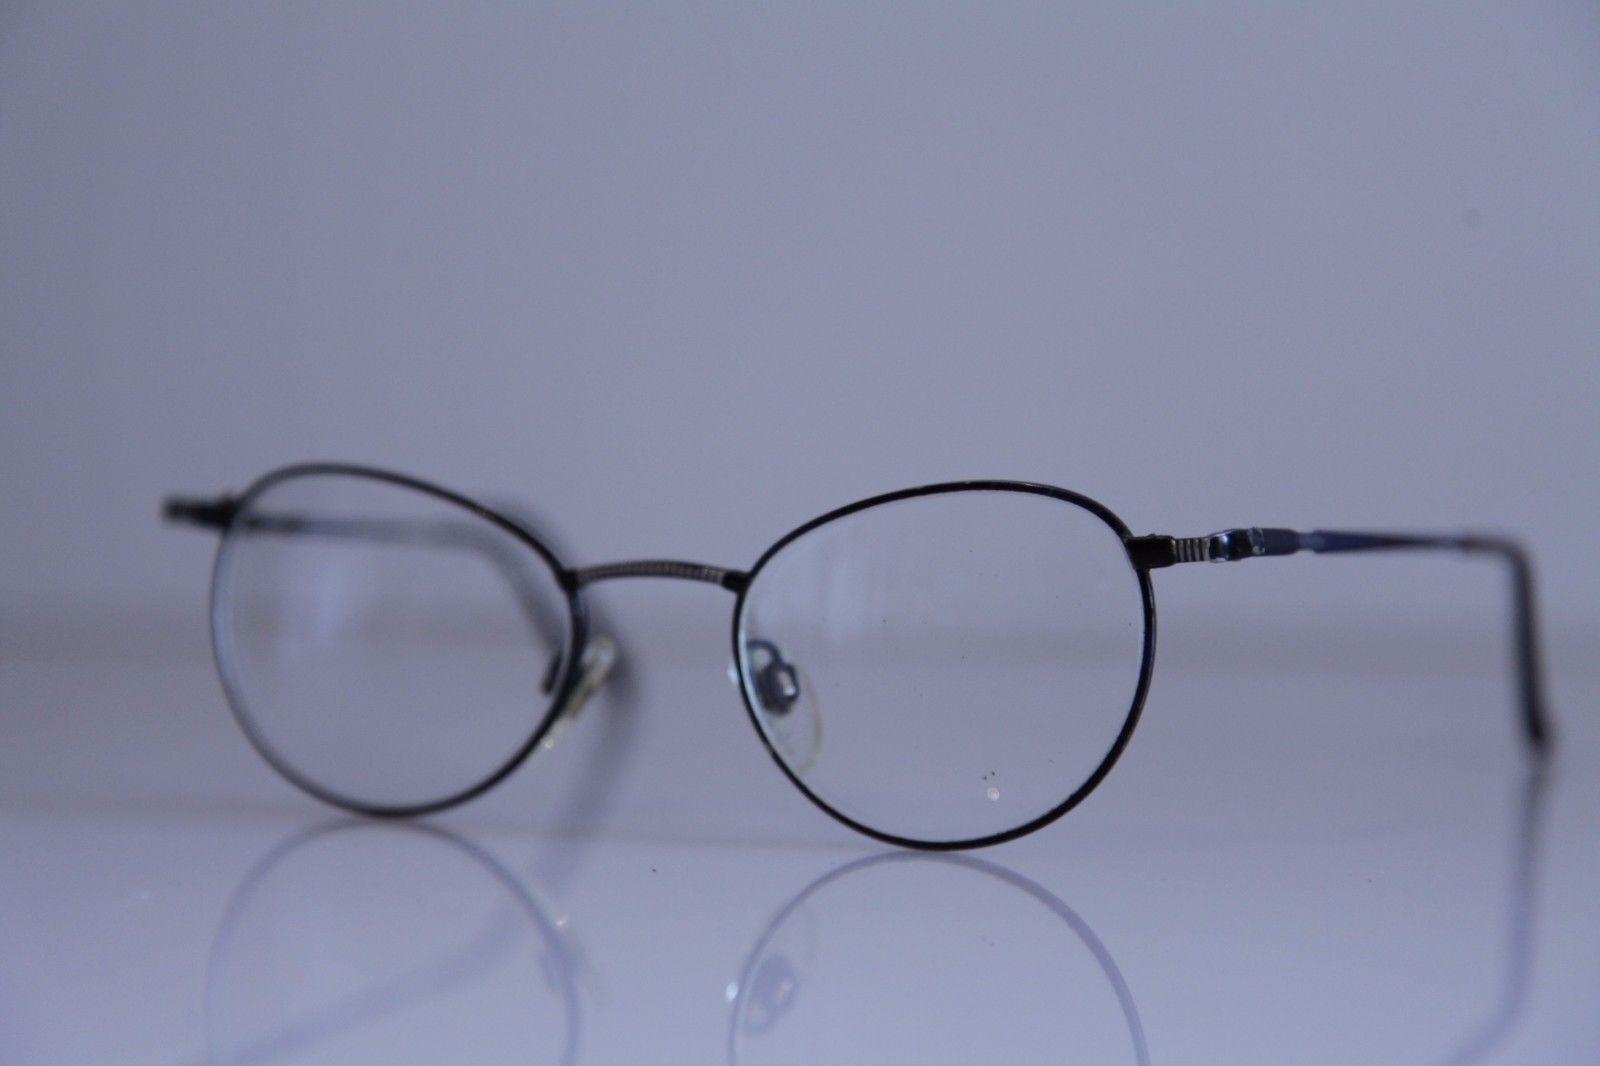 Vintage METZLER Eyewear, Dark Blue Frame, RX-Able  Prescription lenses. GERMANY